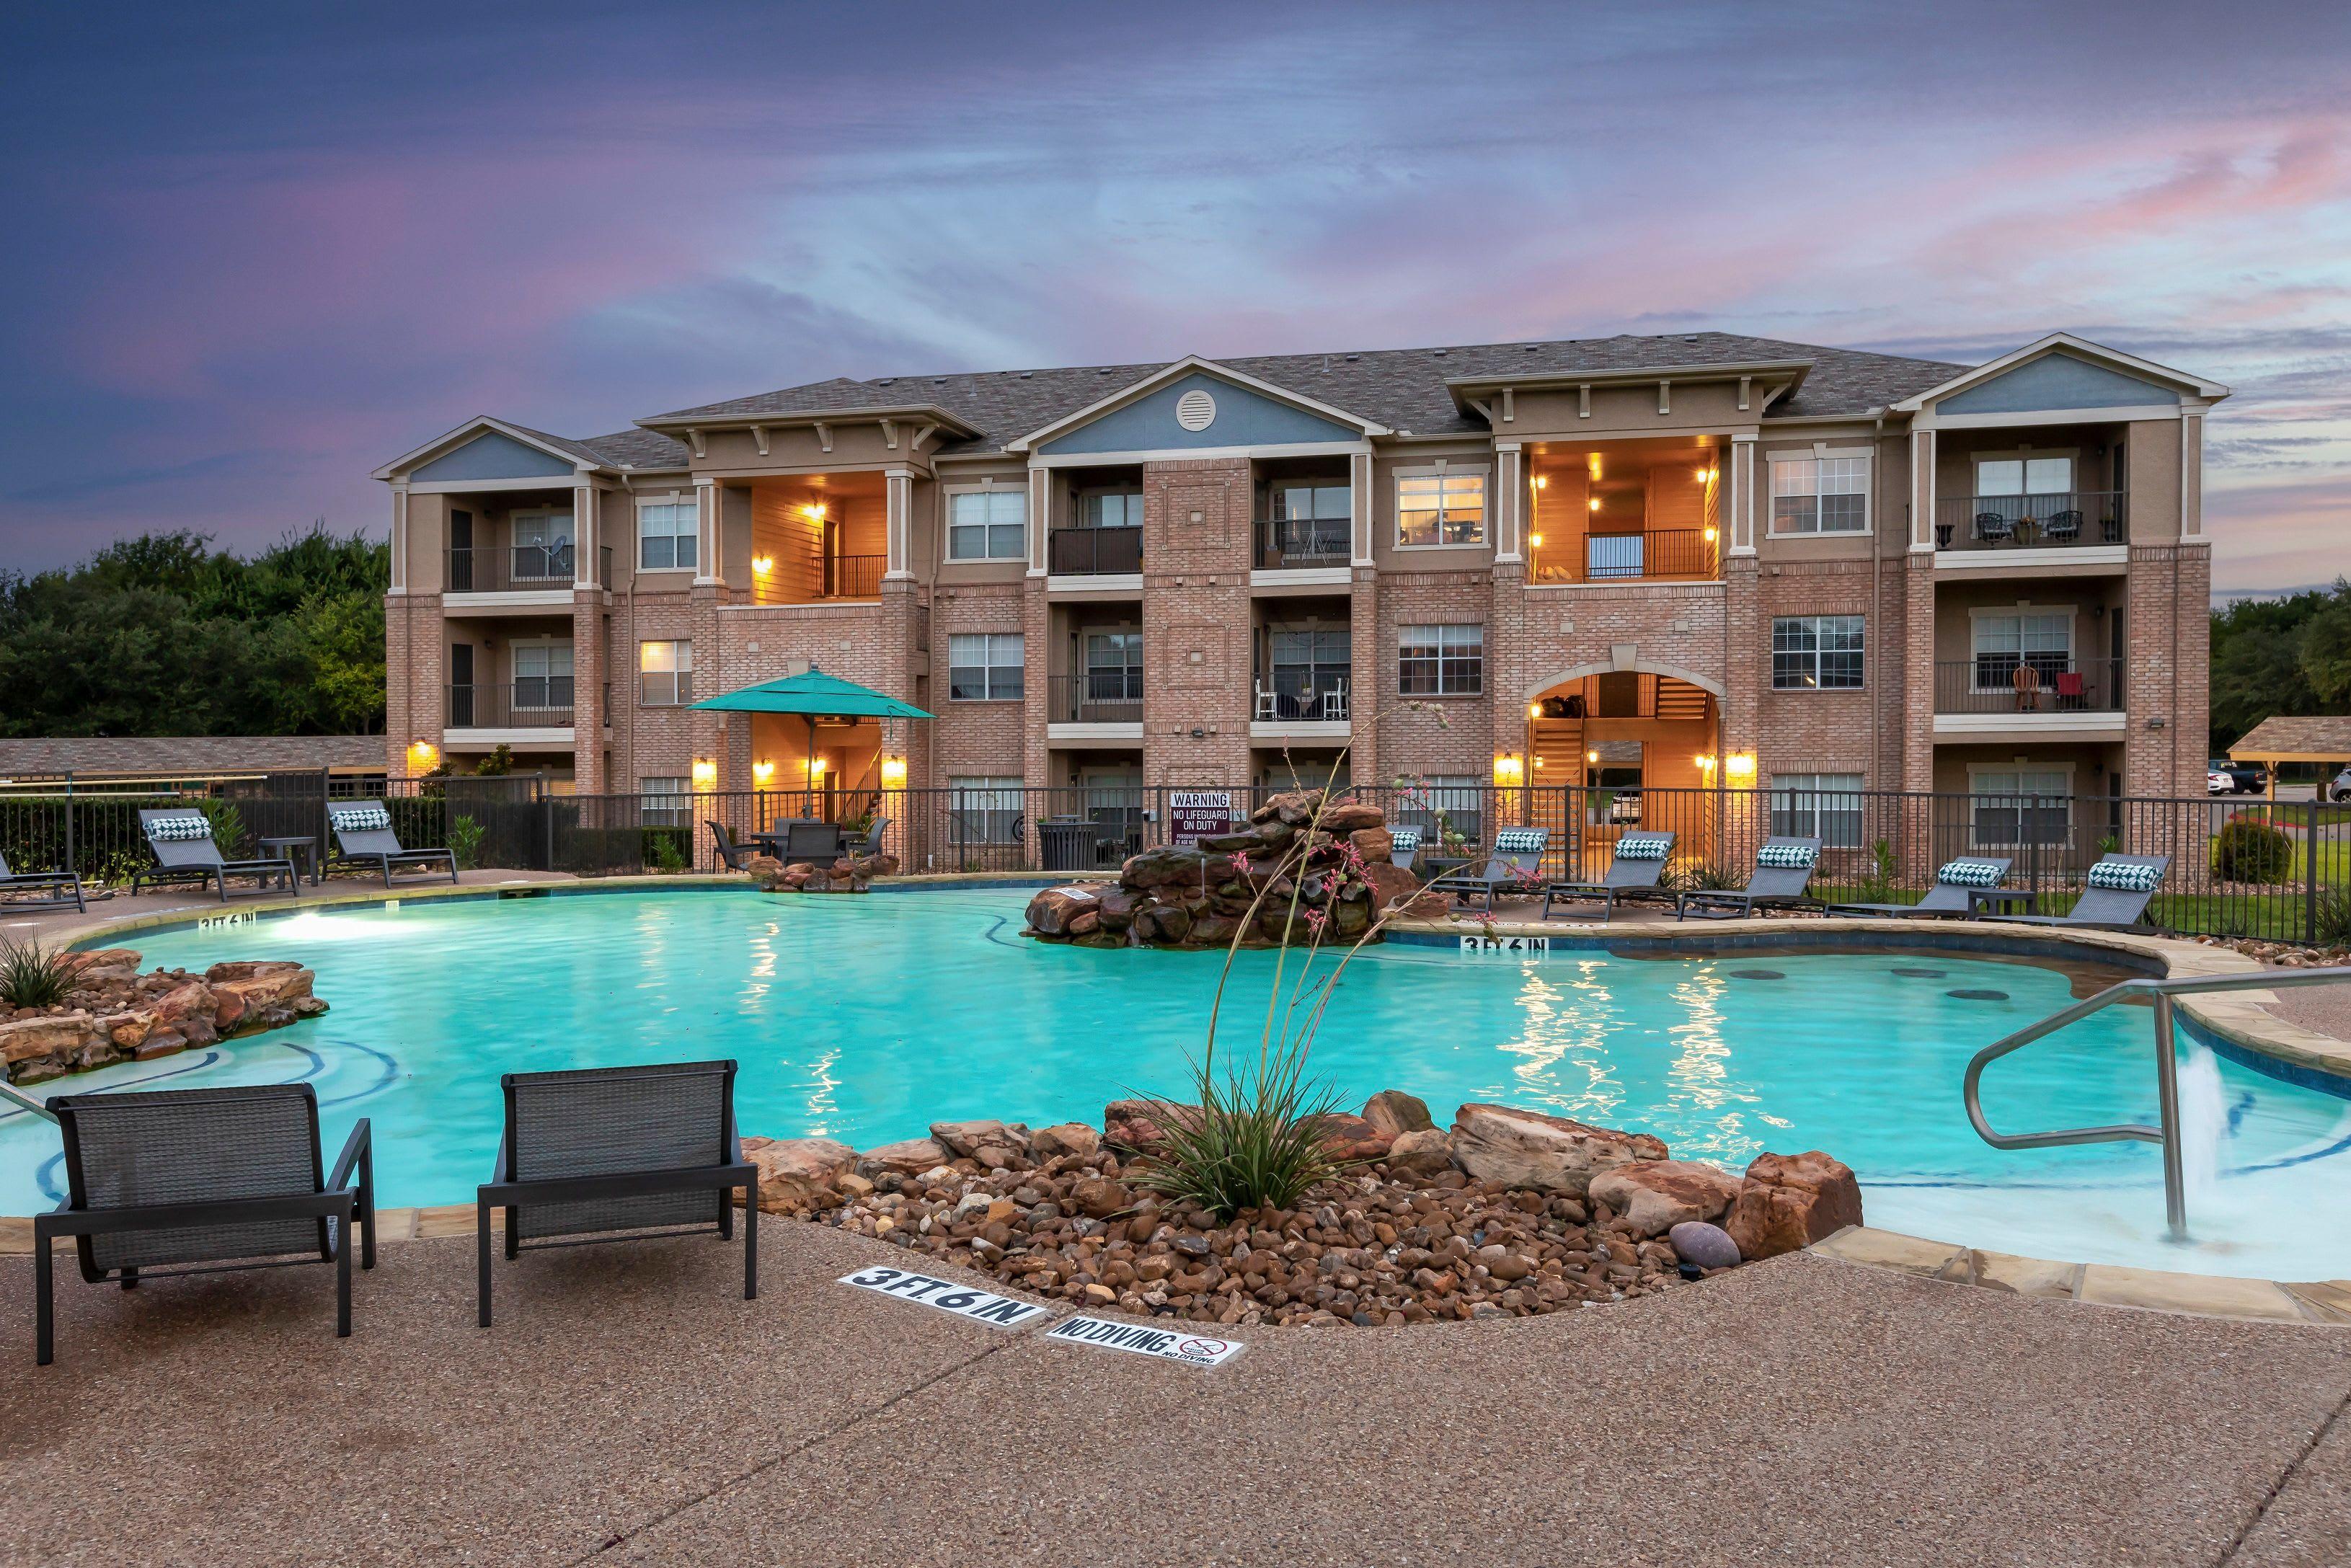 Apartments at Ranch at Hudson Xing in McKinney, Texas